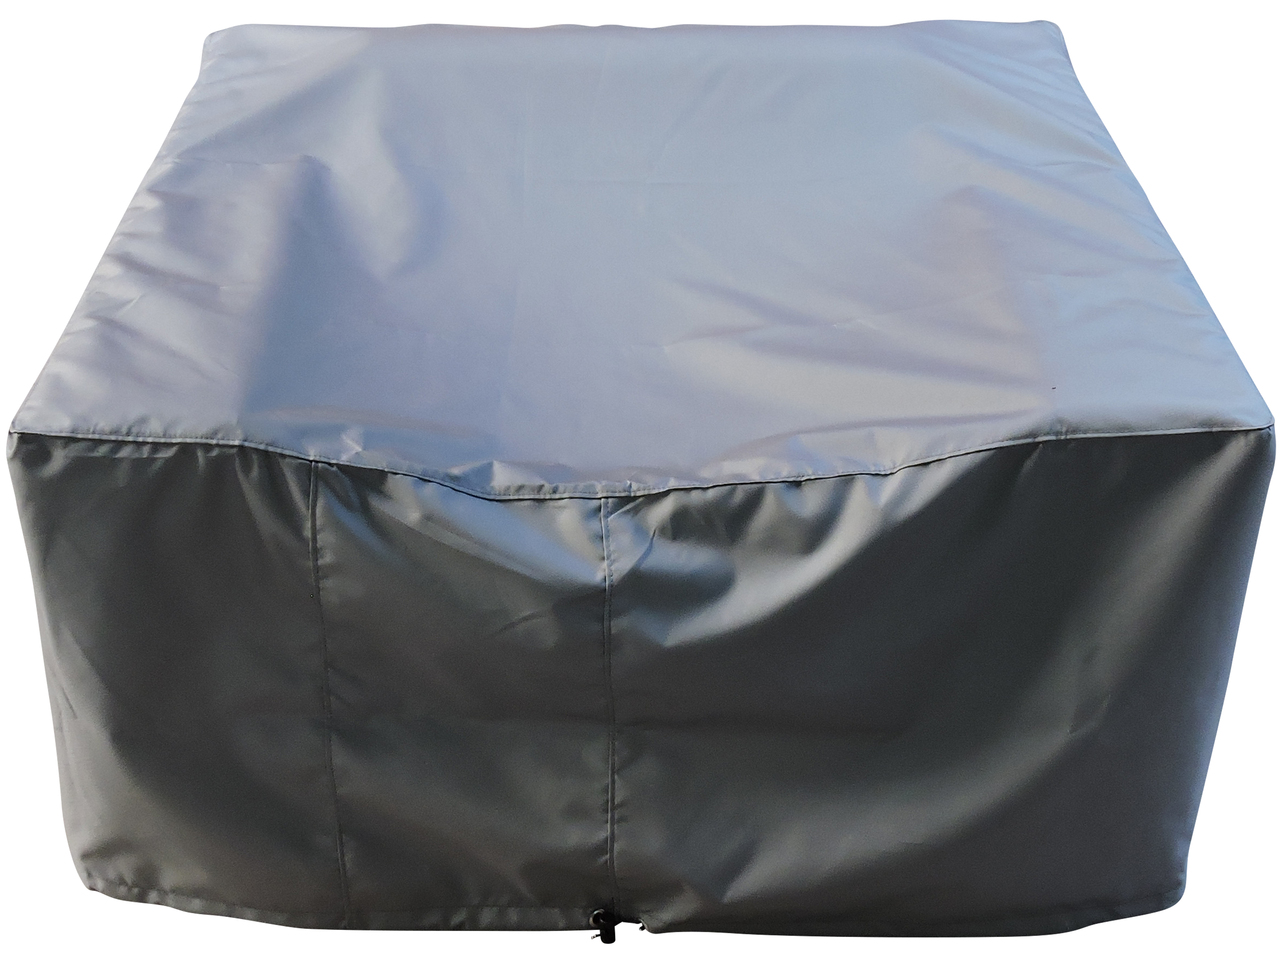 Bravo custom box chair cover